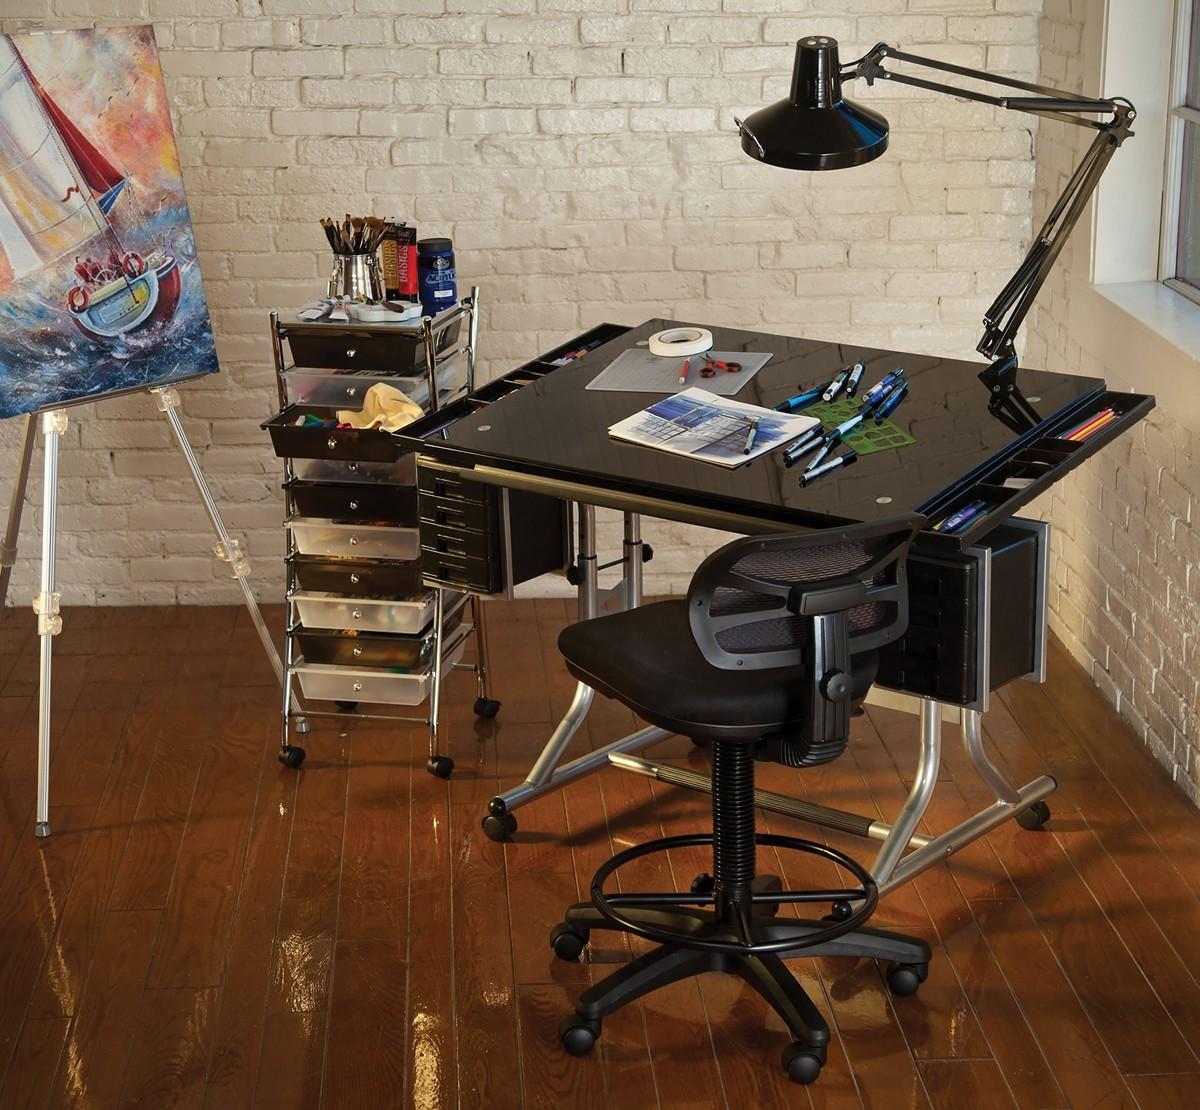 Alvin Craftsmaster Ii Glass Top Deluxe Art Drawing Table Rex Art Supplies